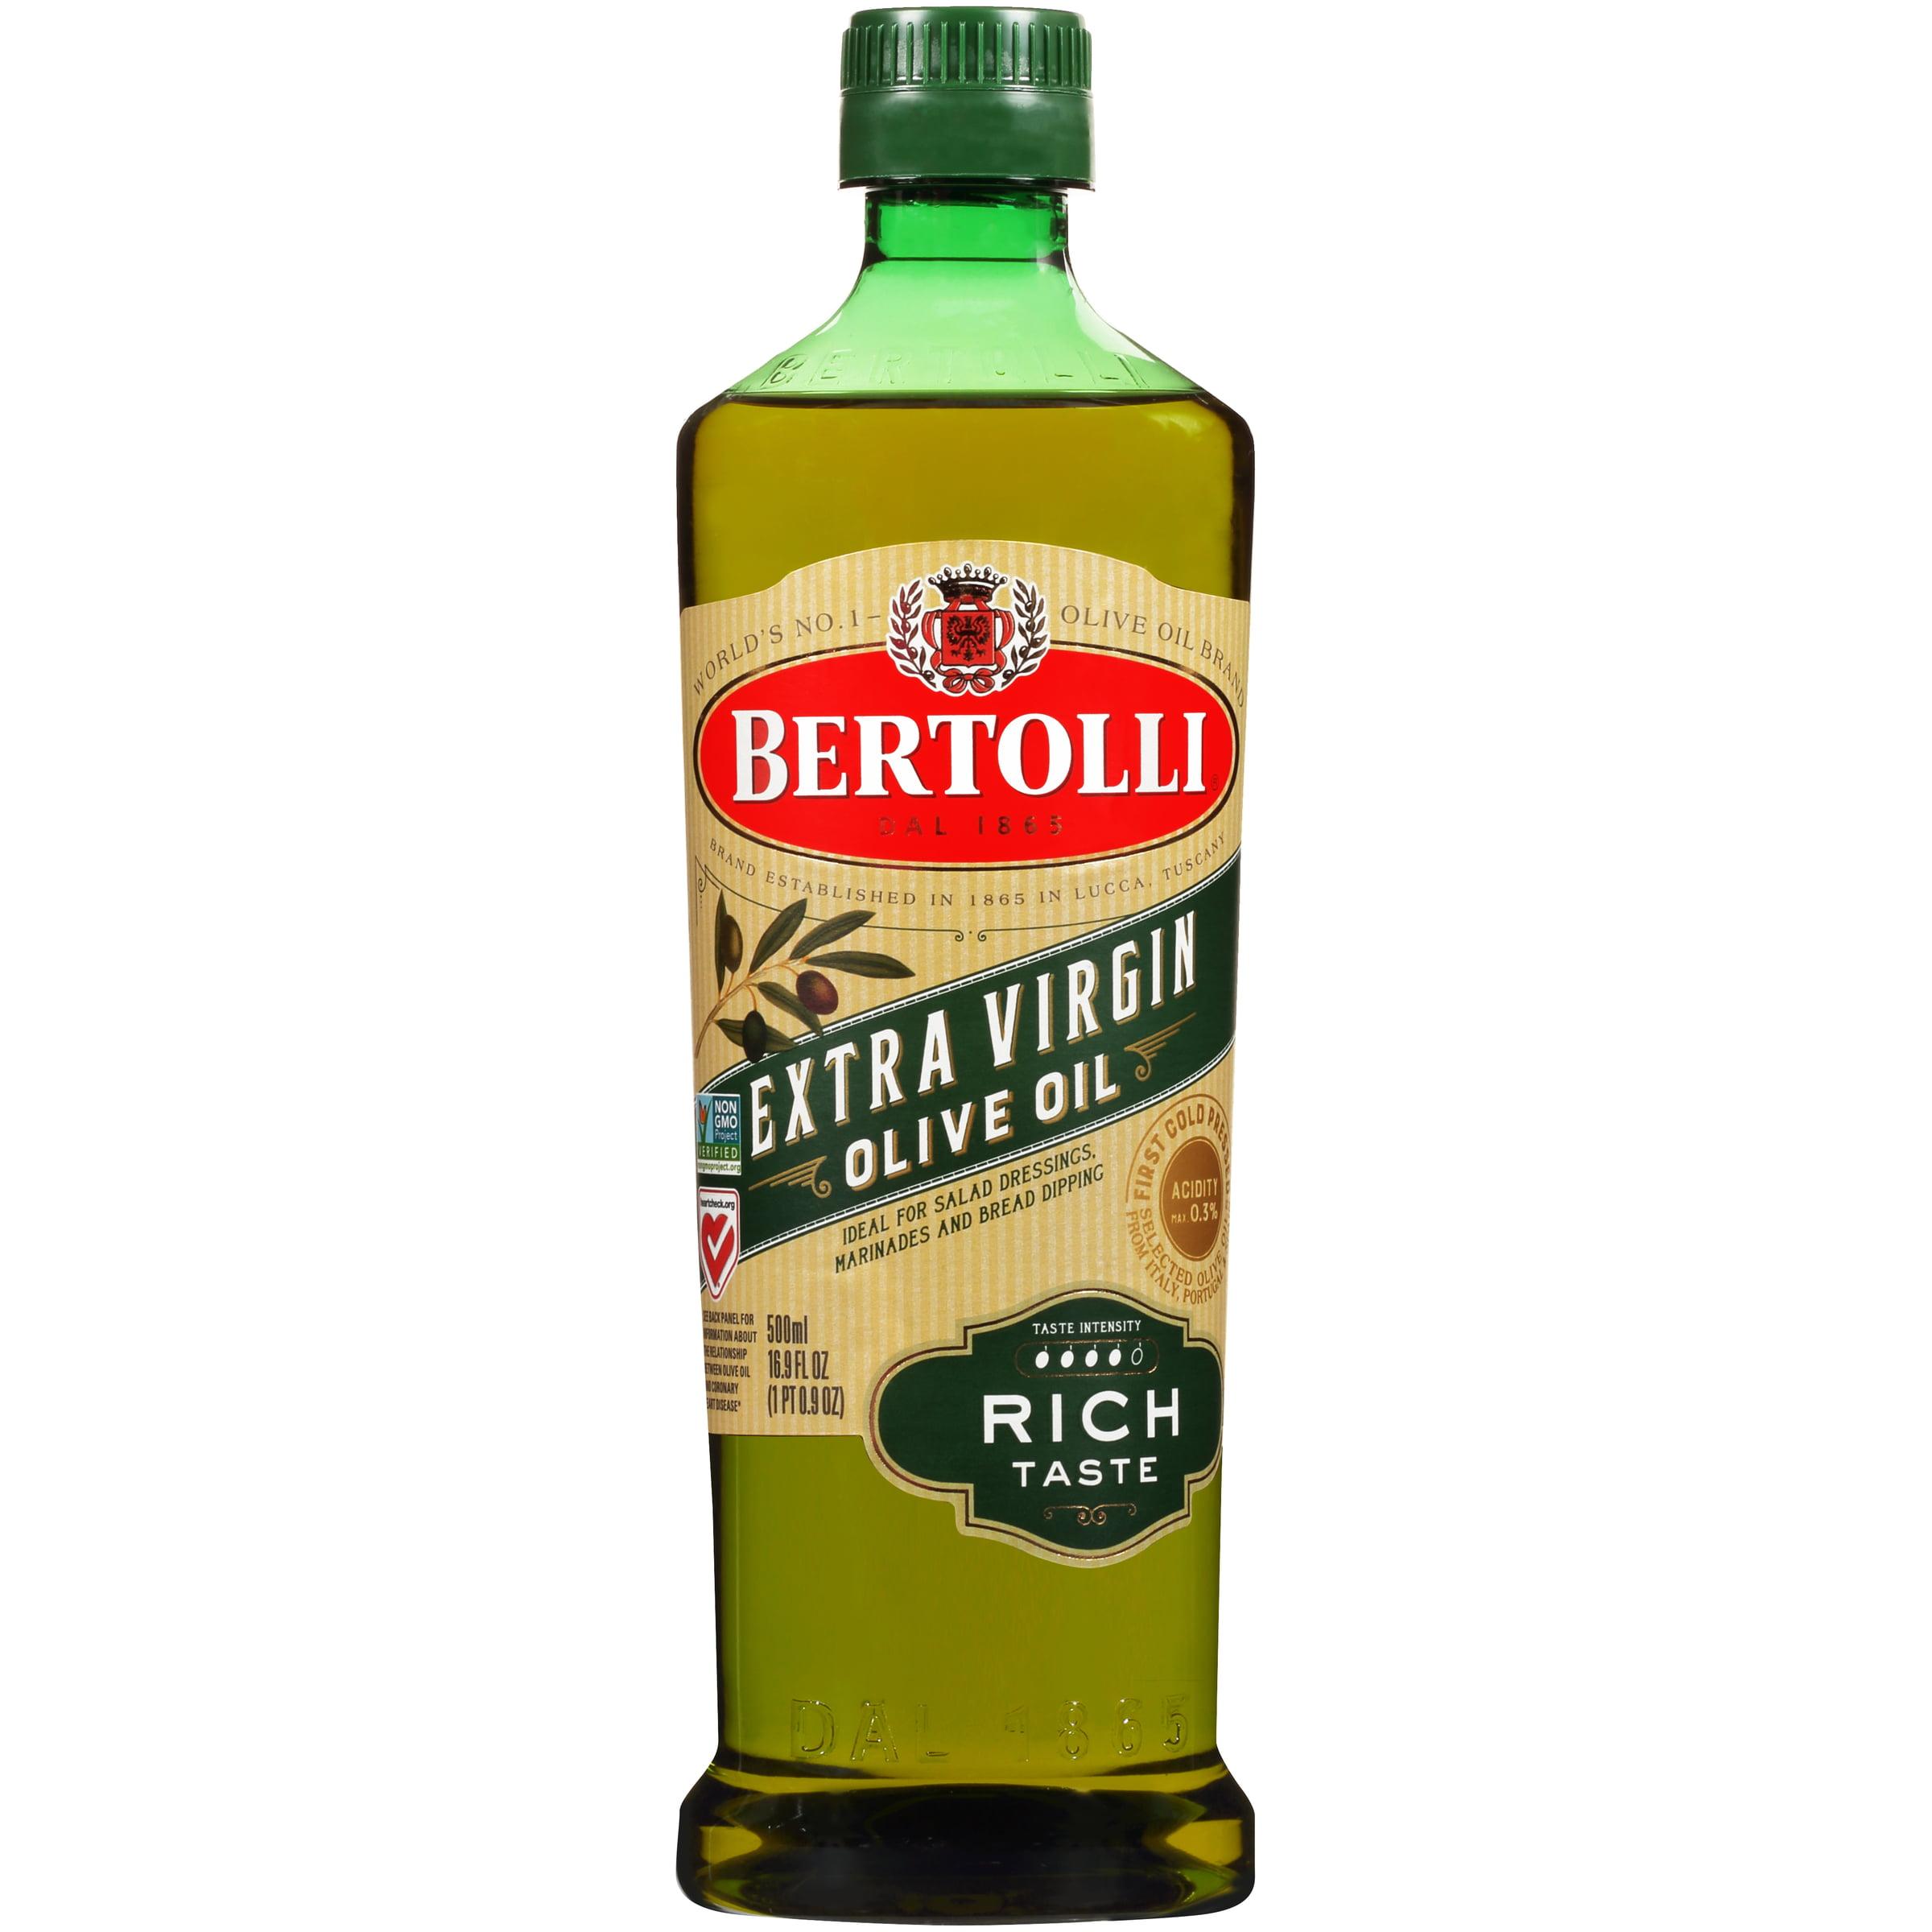 Bertolli, Original, ExtraVirgin Olive Oil, 8.8 fl oz